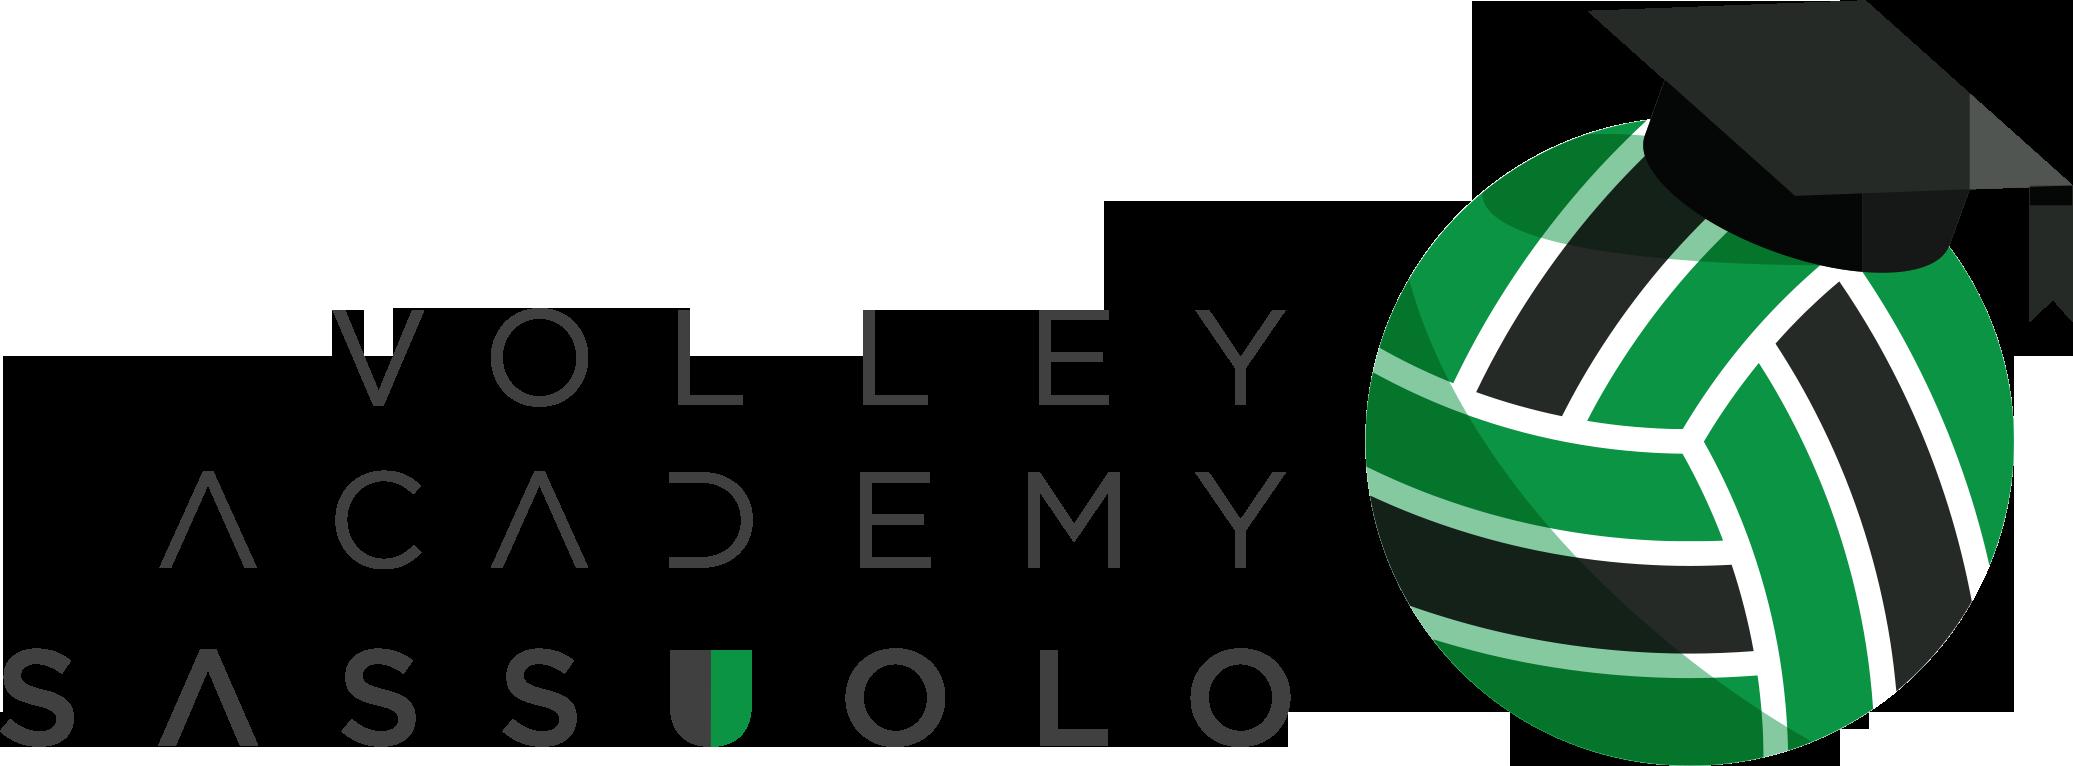 www.volleyacademysassuolo.it